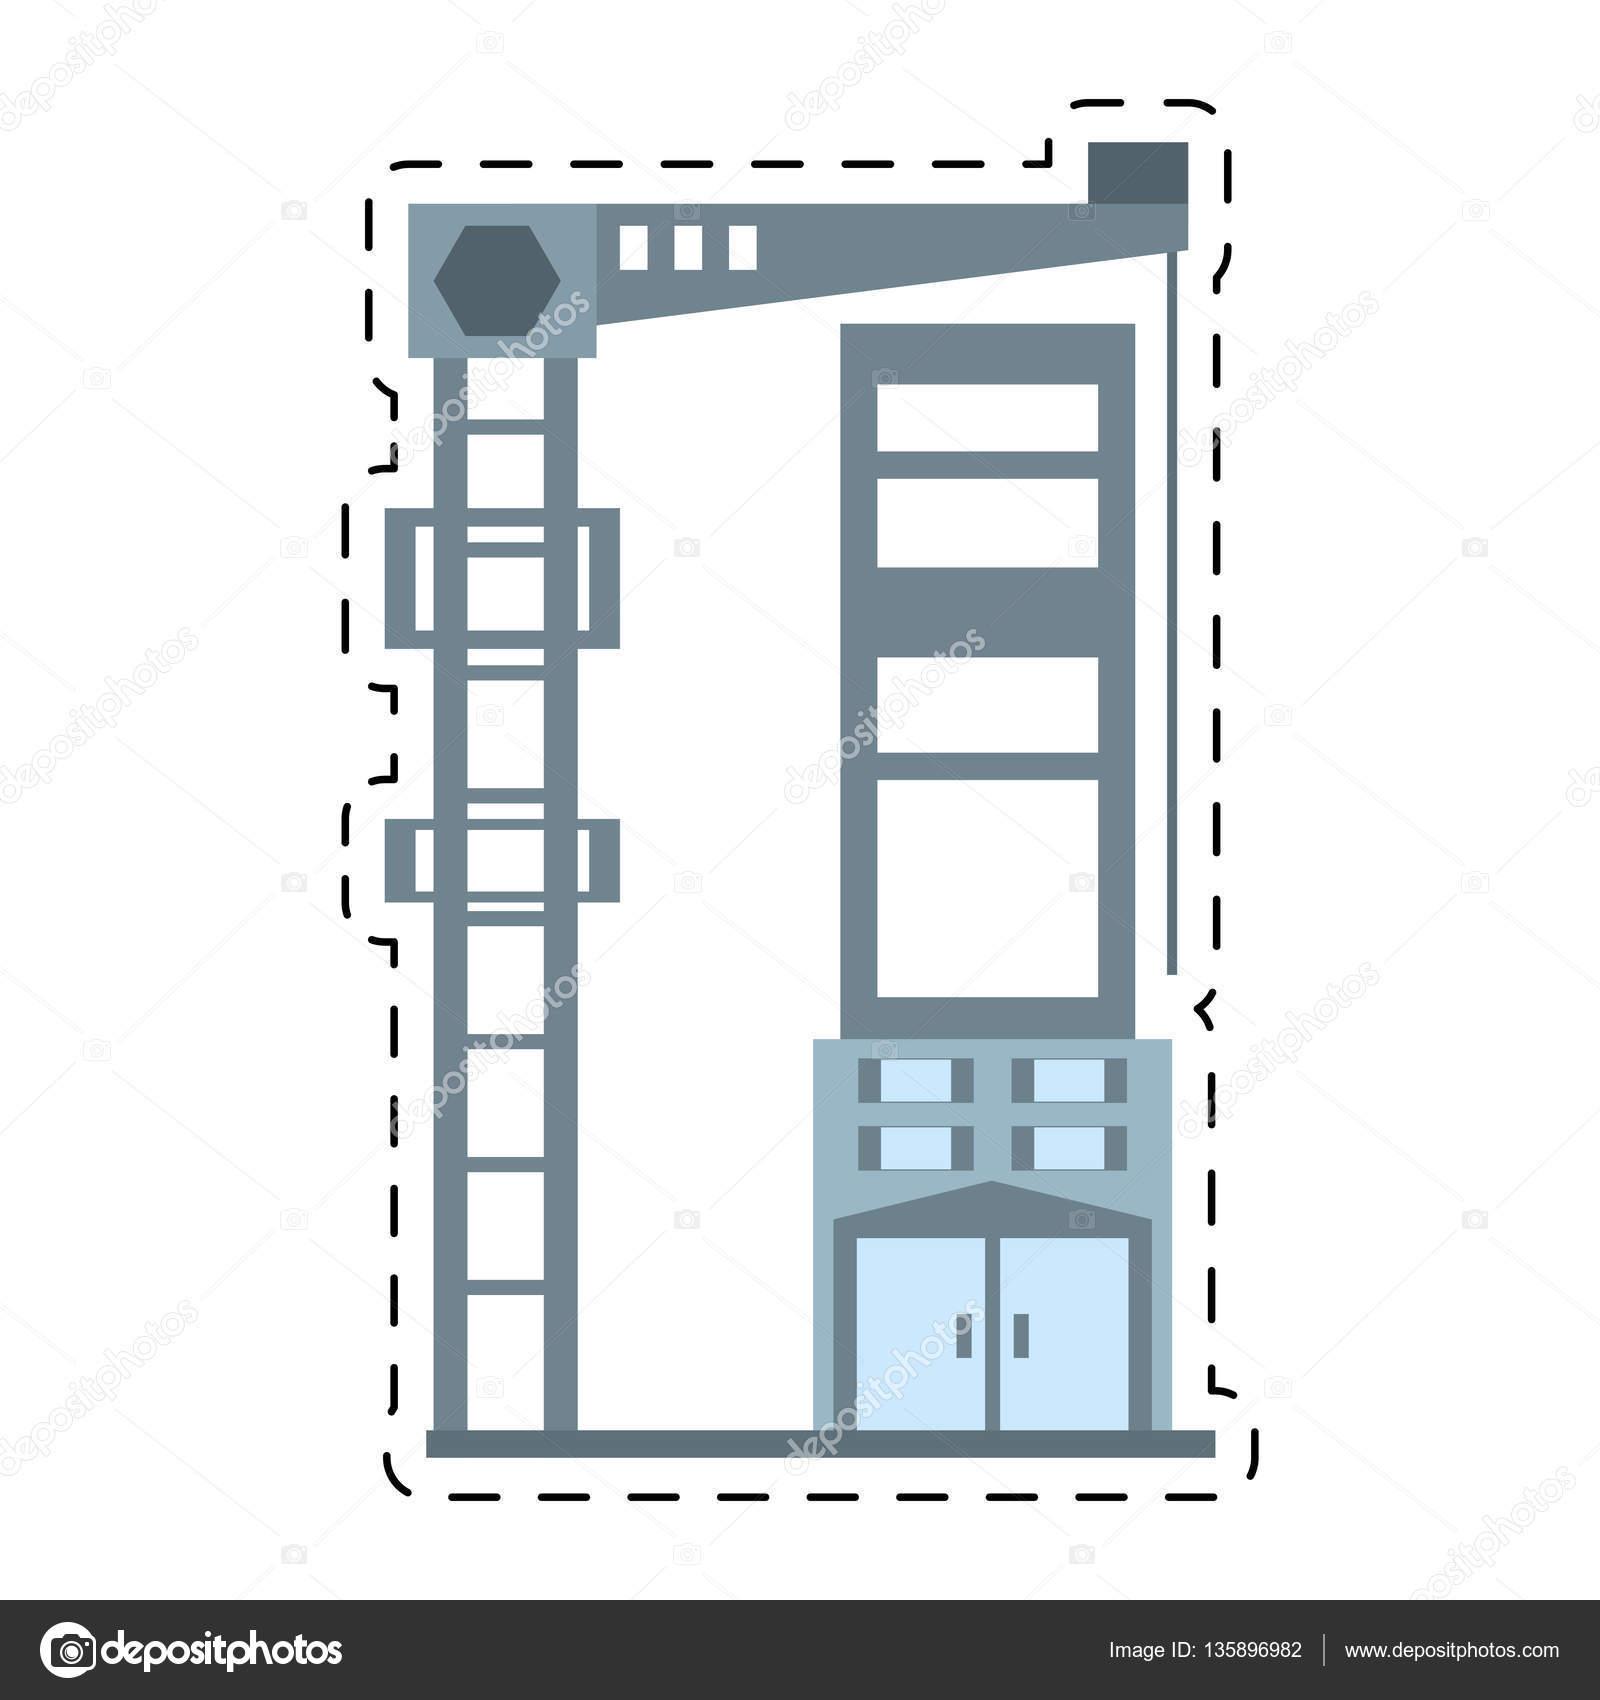 Aufzug Bau Gebäudestruktur Schnittlinie — Stockvektor © Djv #135896982